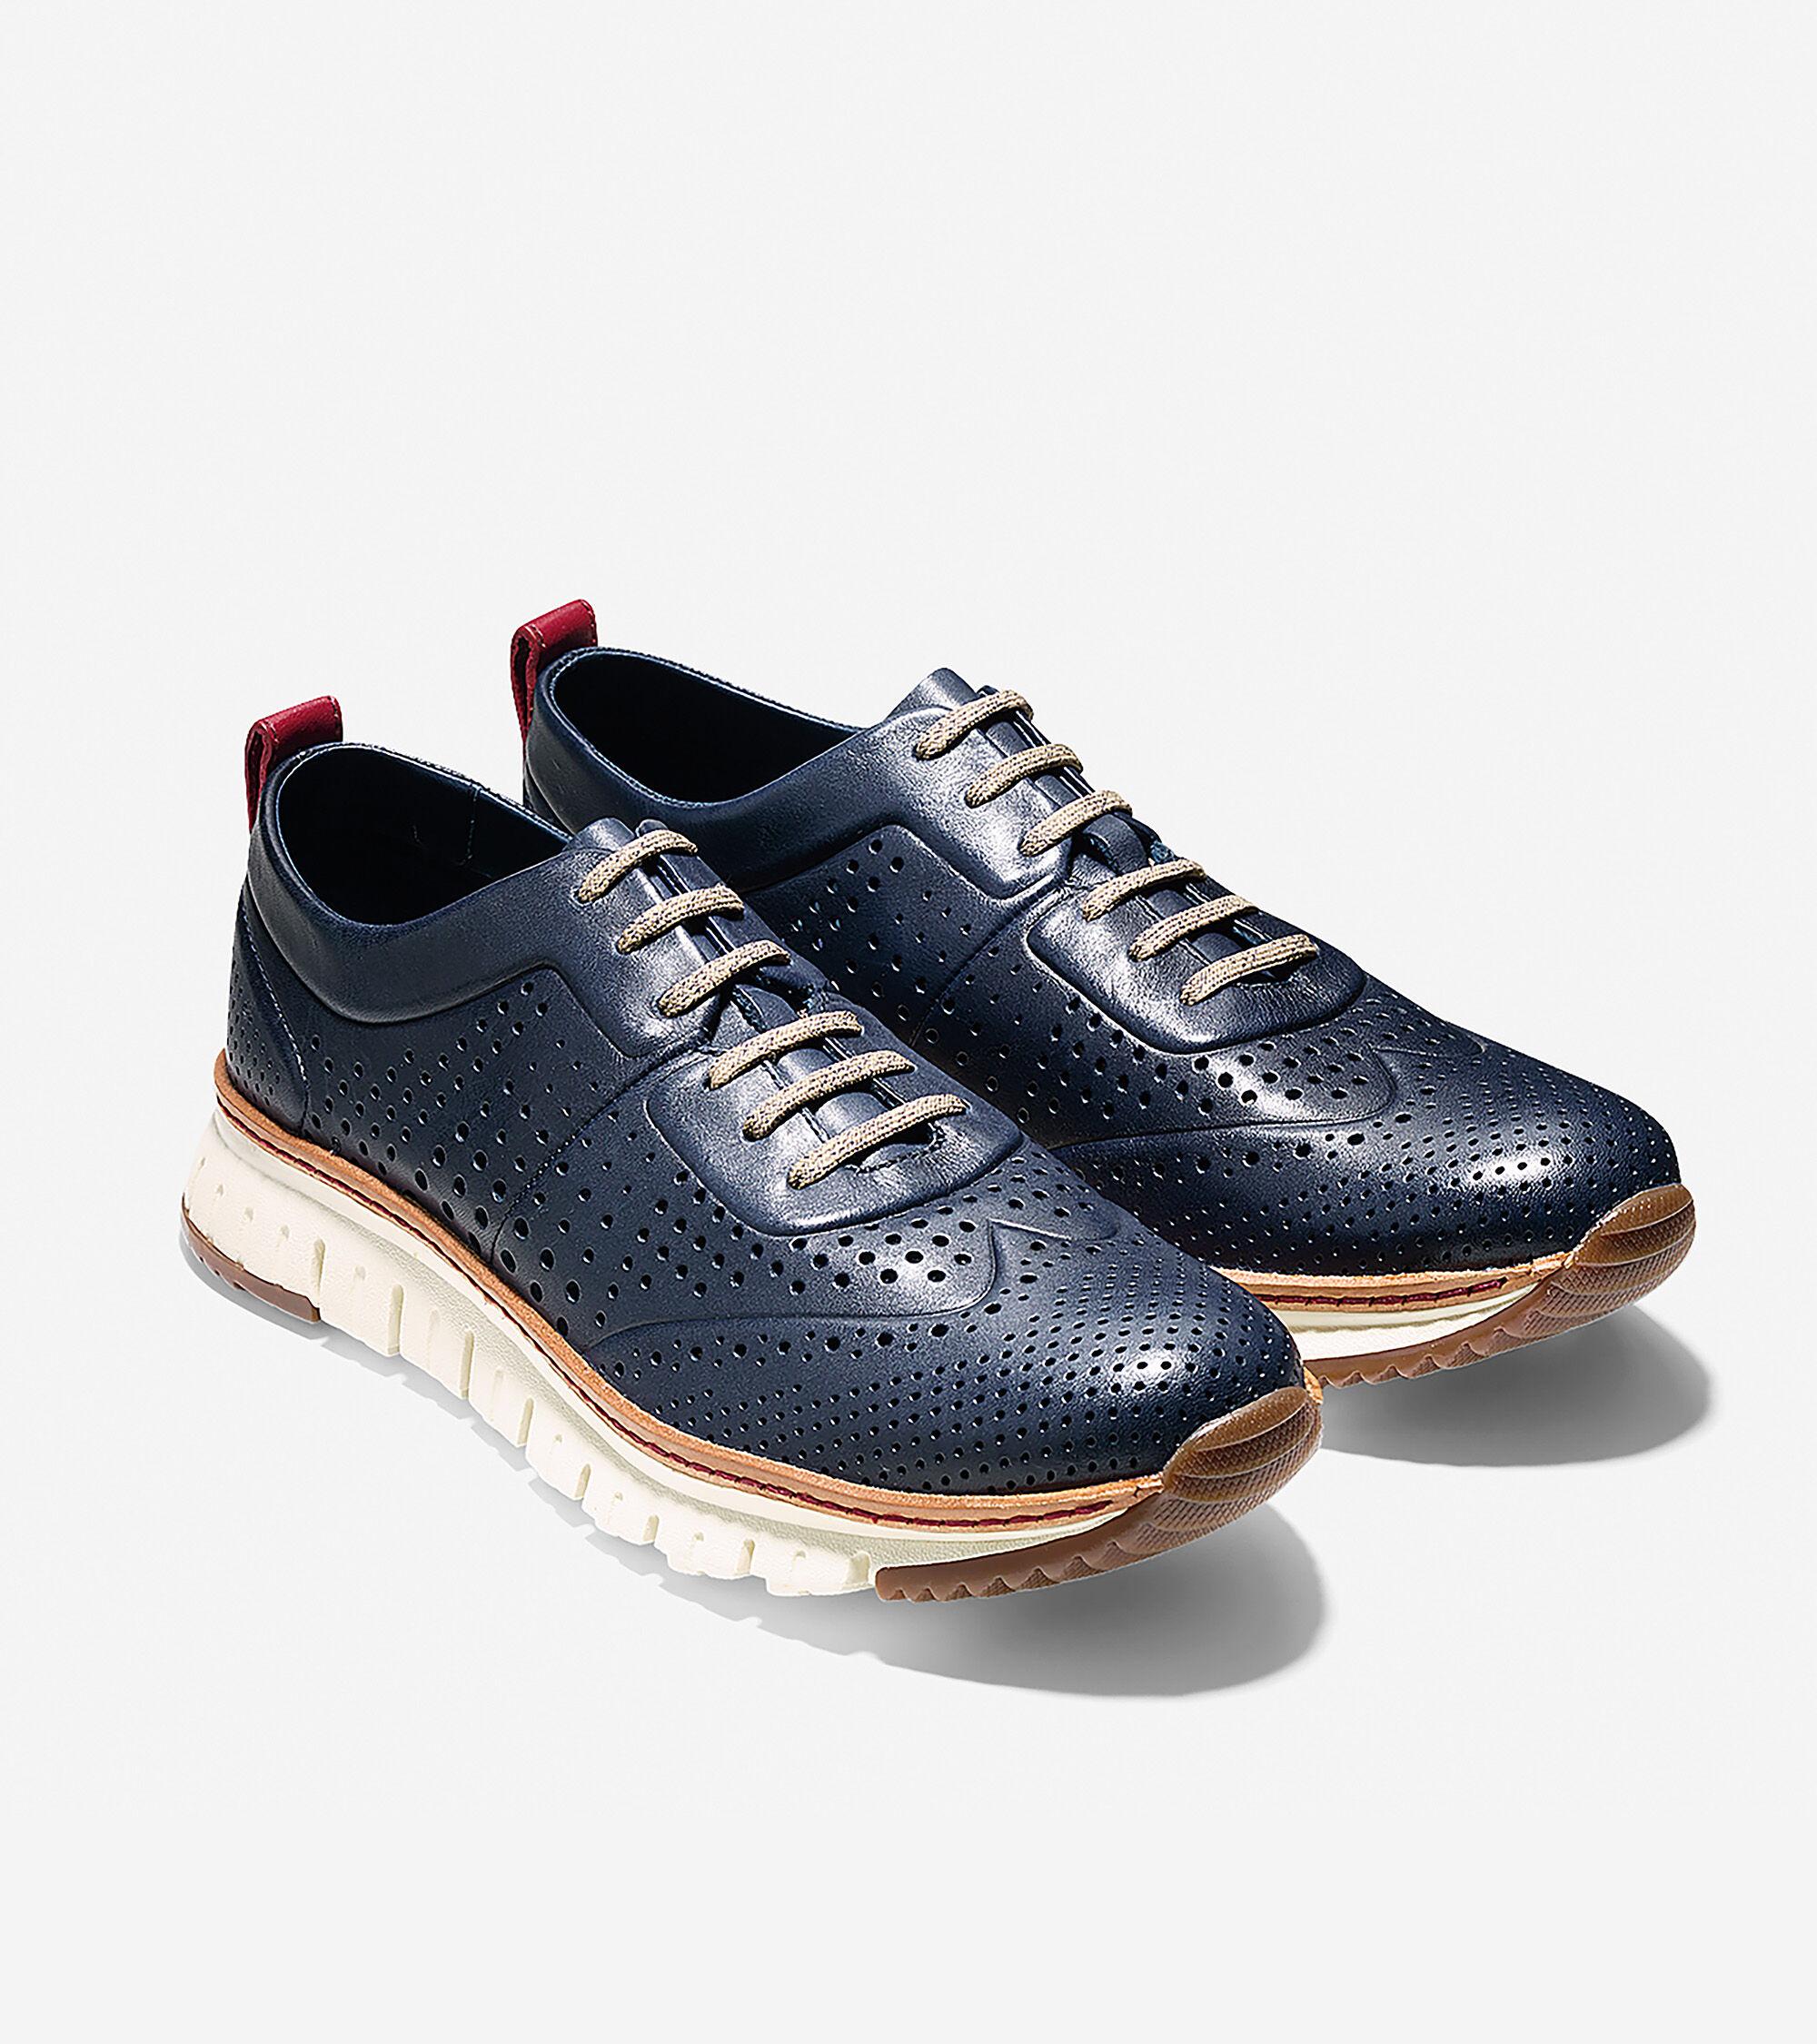 ... Men's ZERØGRAND Perforated Sneaker; Men's ZERØGRAND Perforated Sneaker.  #colehaan